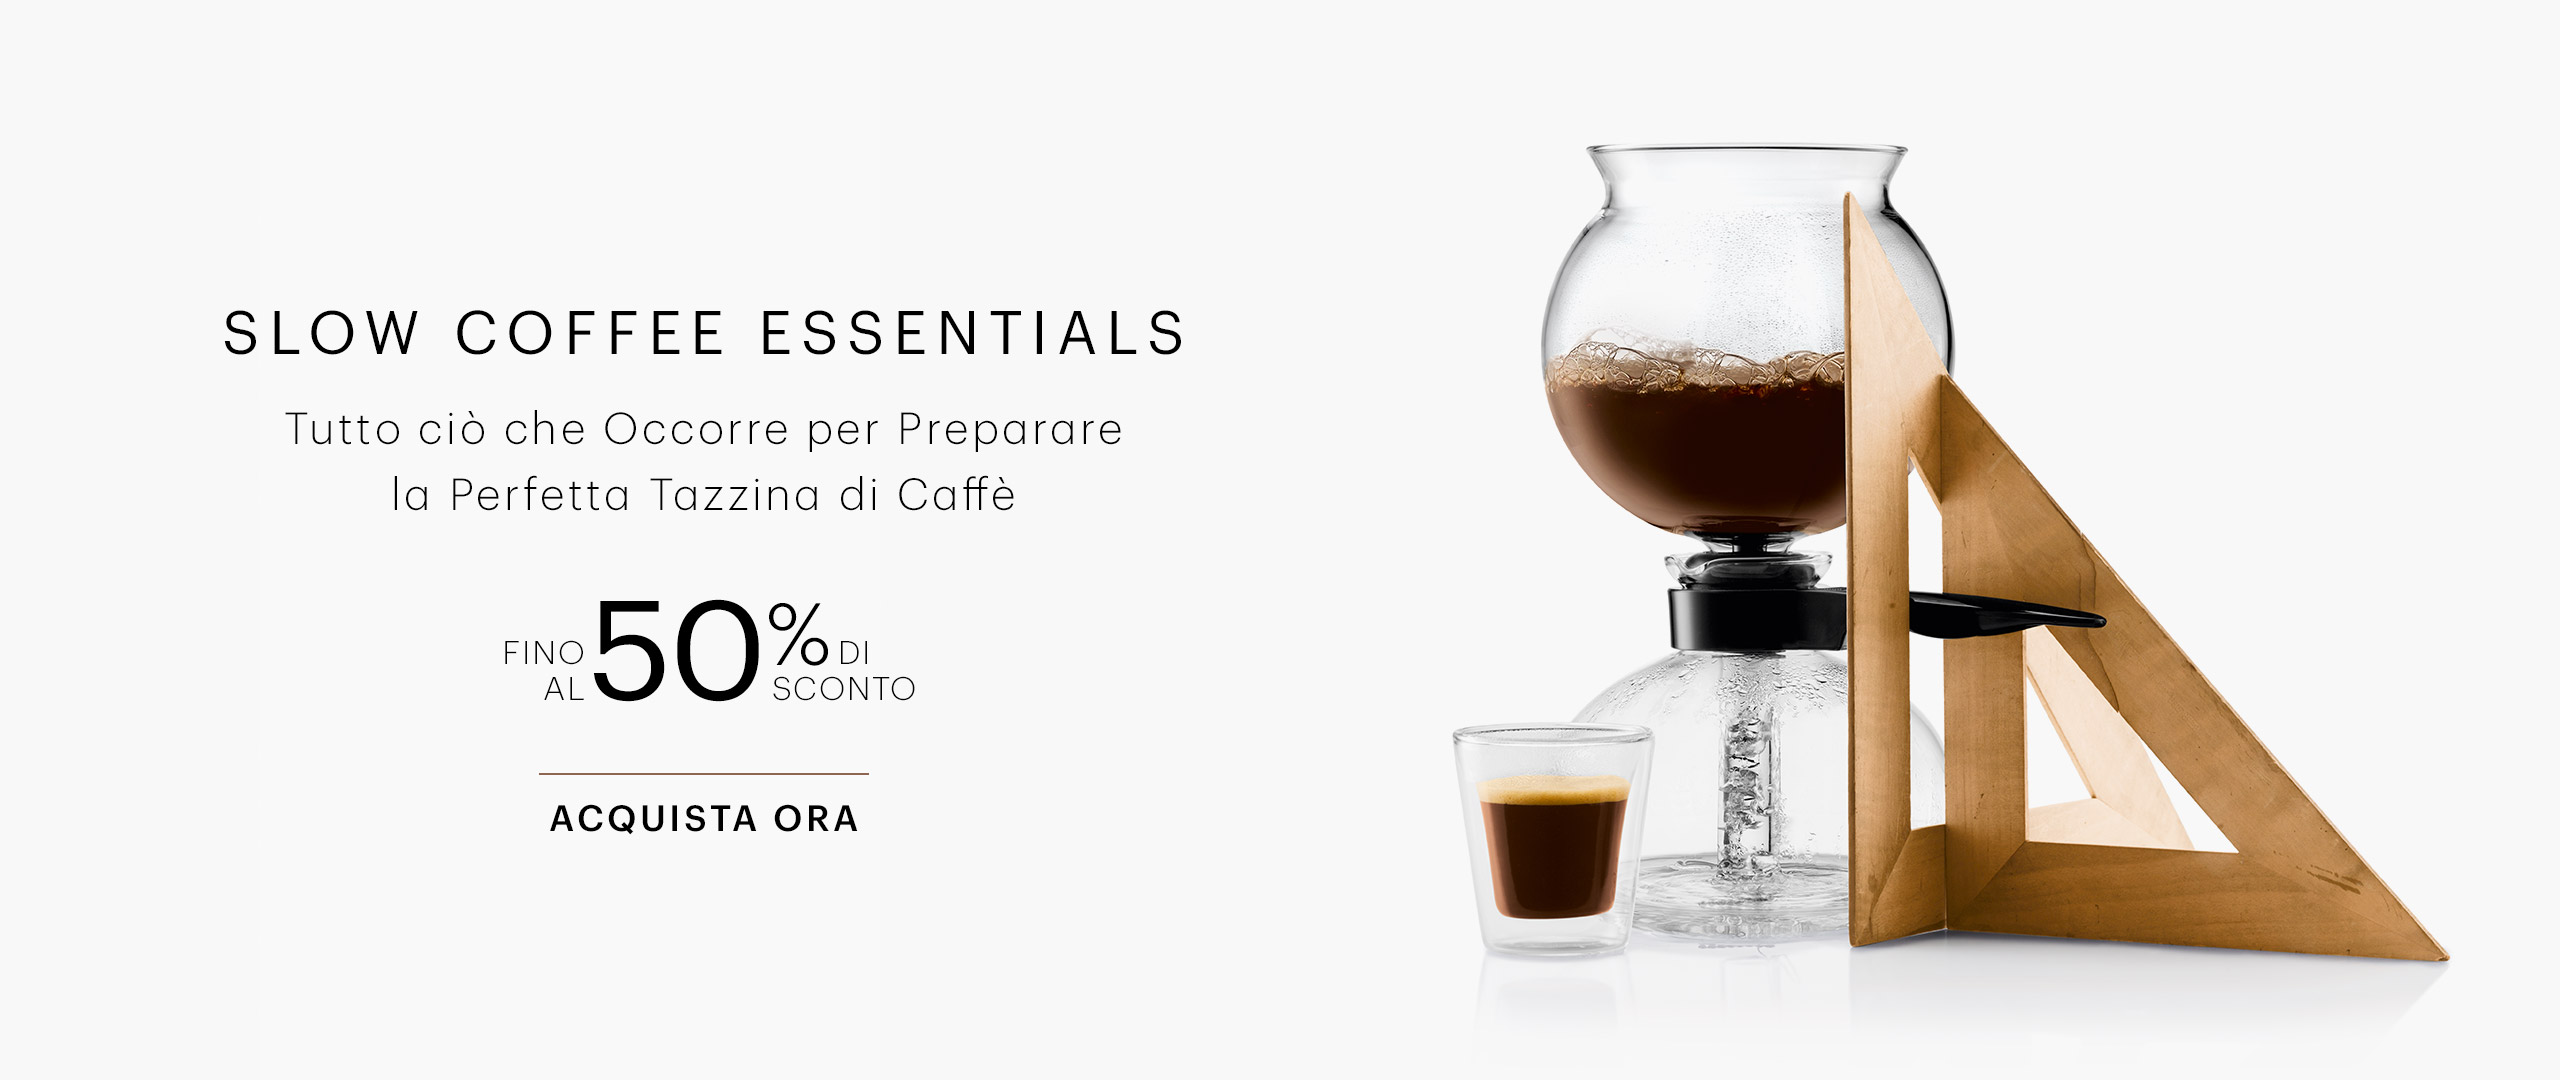 BEU [IT] - Slow Coffee Specials